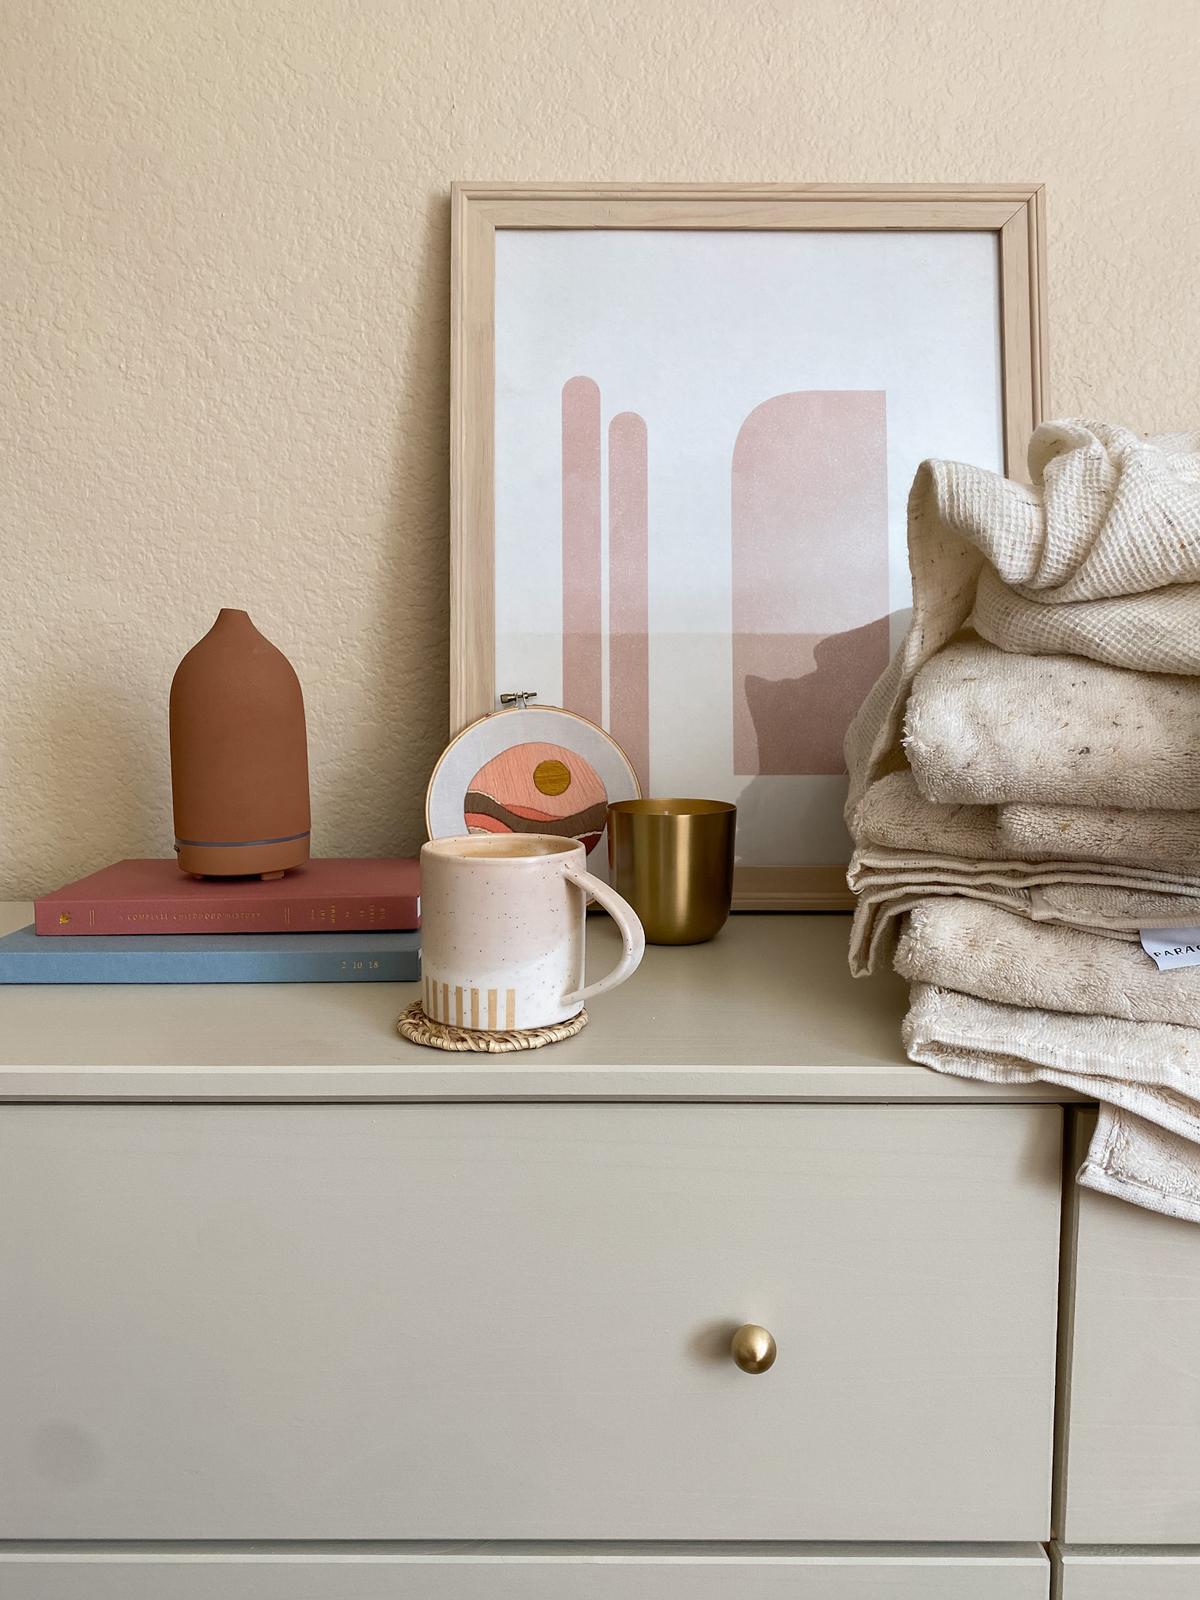 Framed art sitting upright on dresser